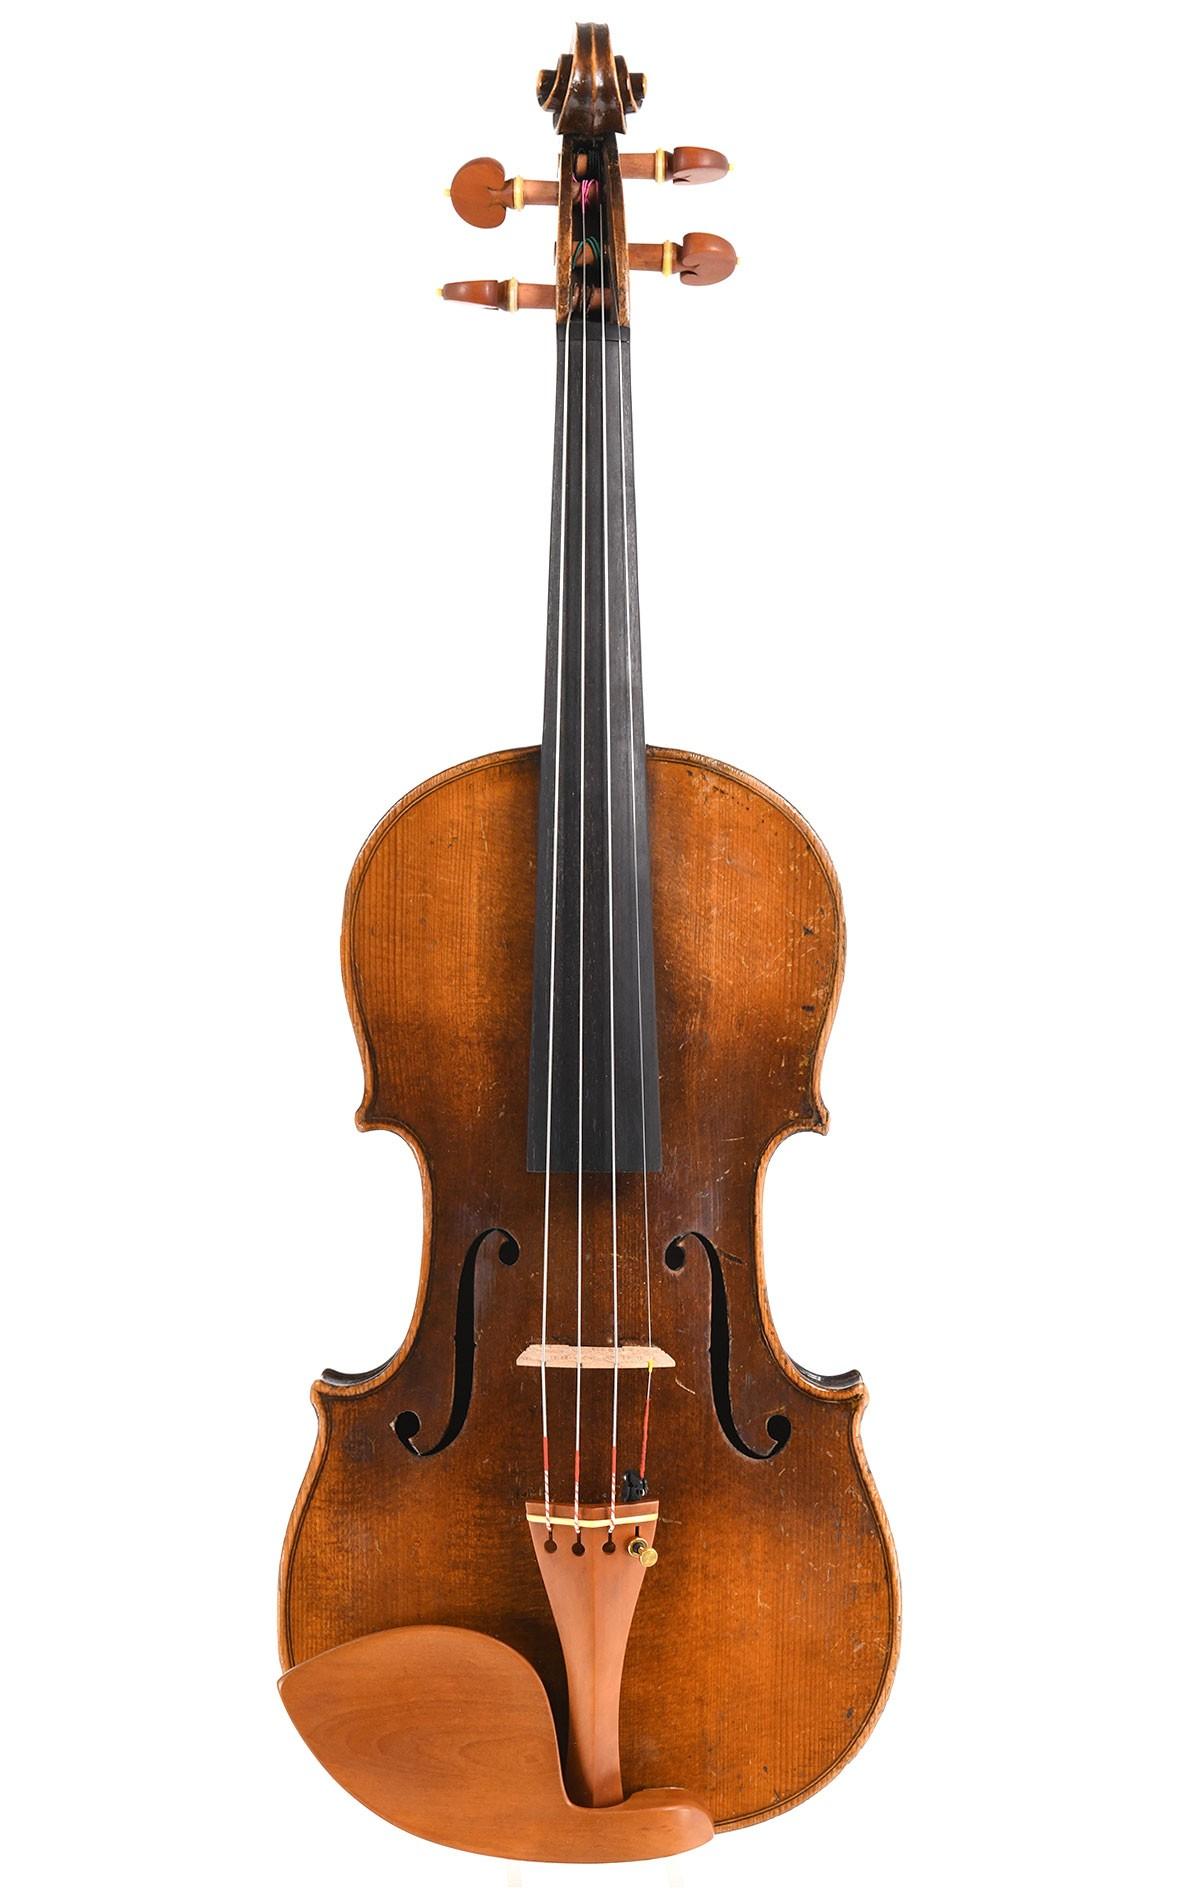 Antike Geige aus Klingenthal um 1850